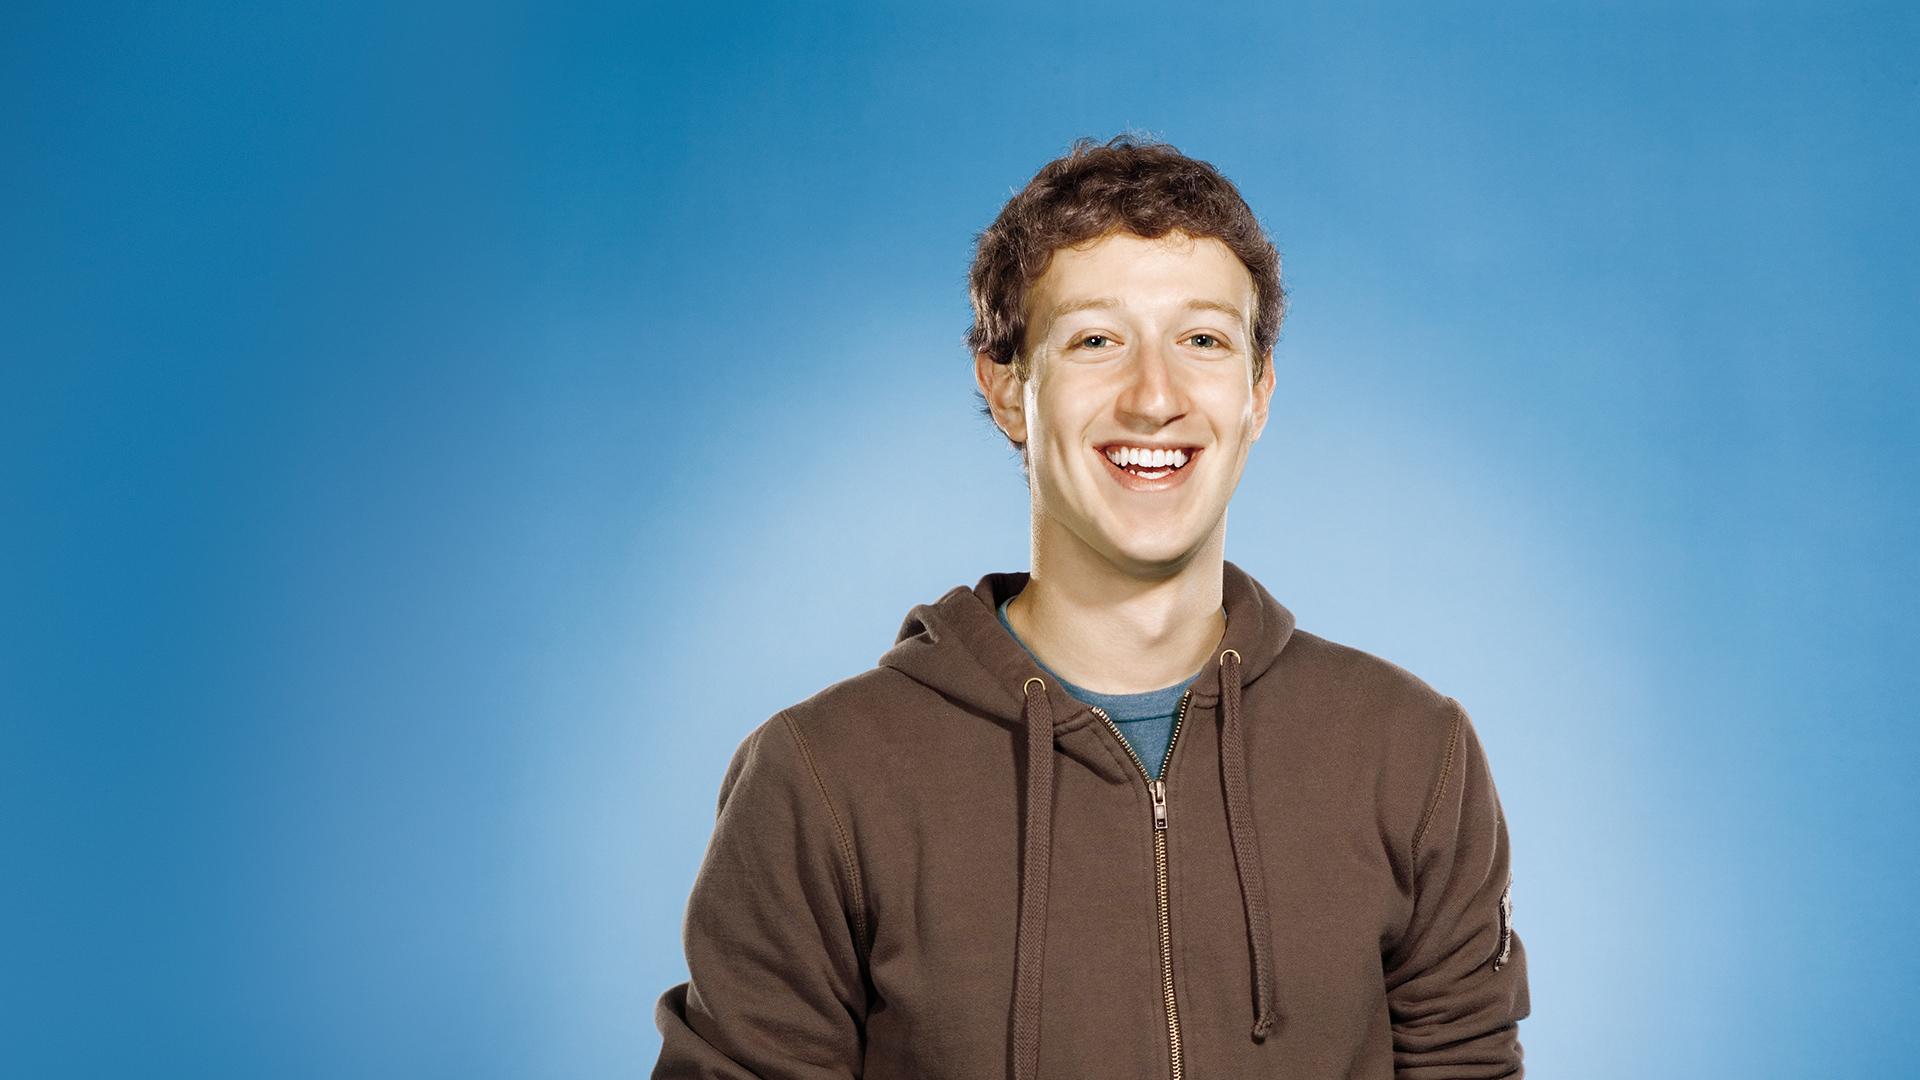 Mark Zuckerberg wallpaper 1920x1080 63801 1920x1080